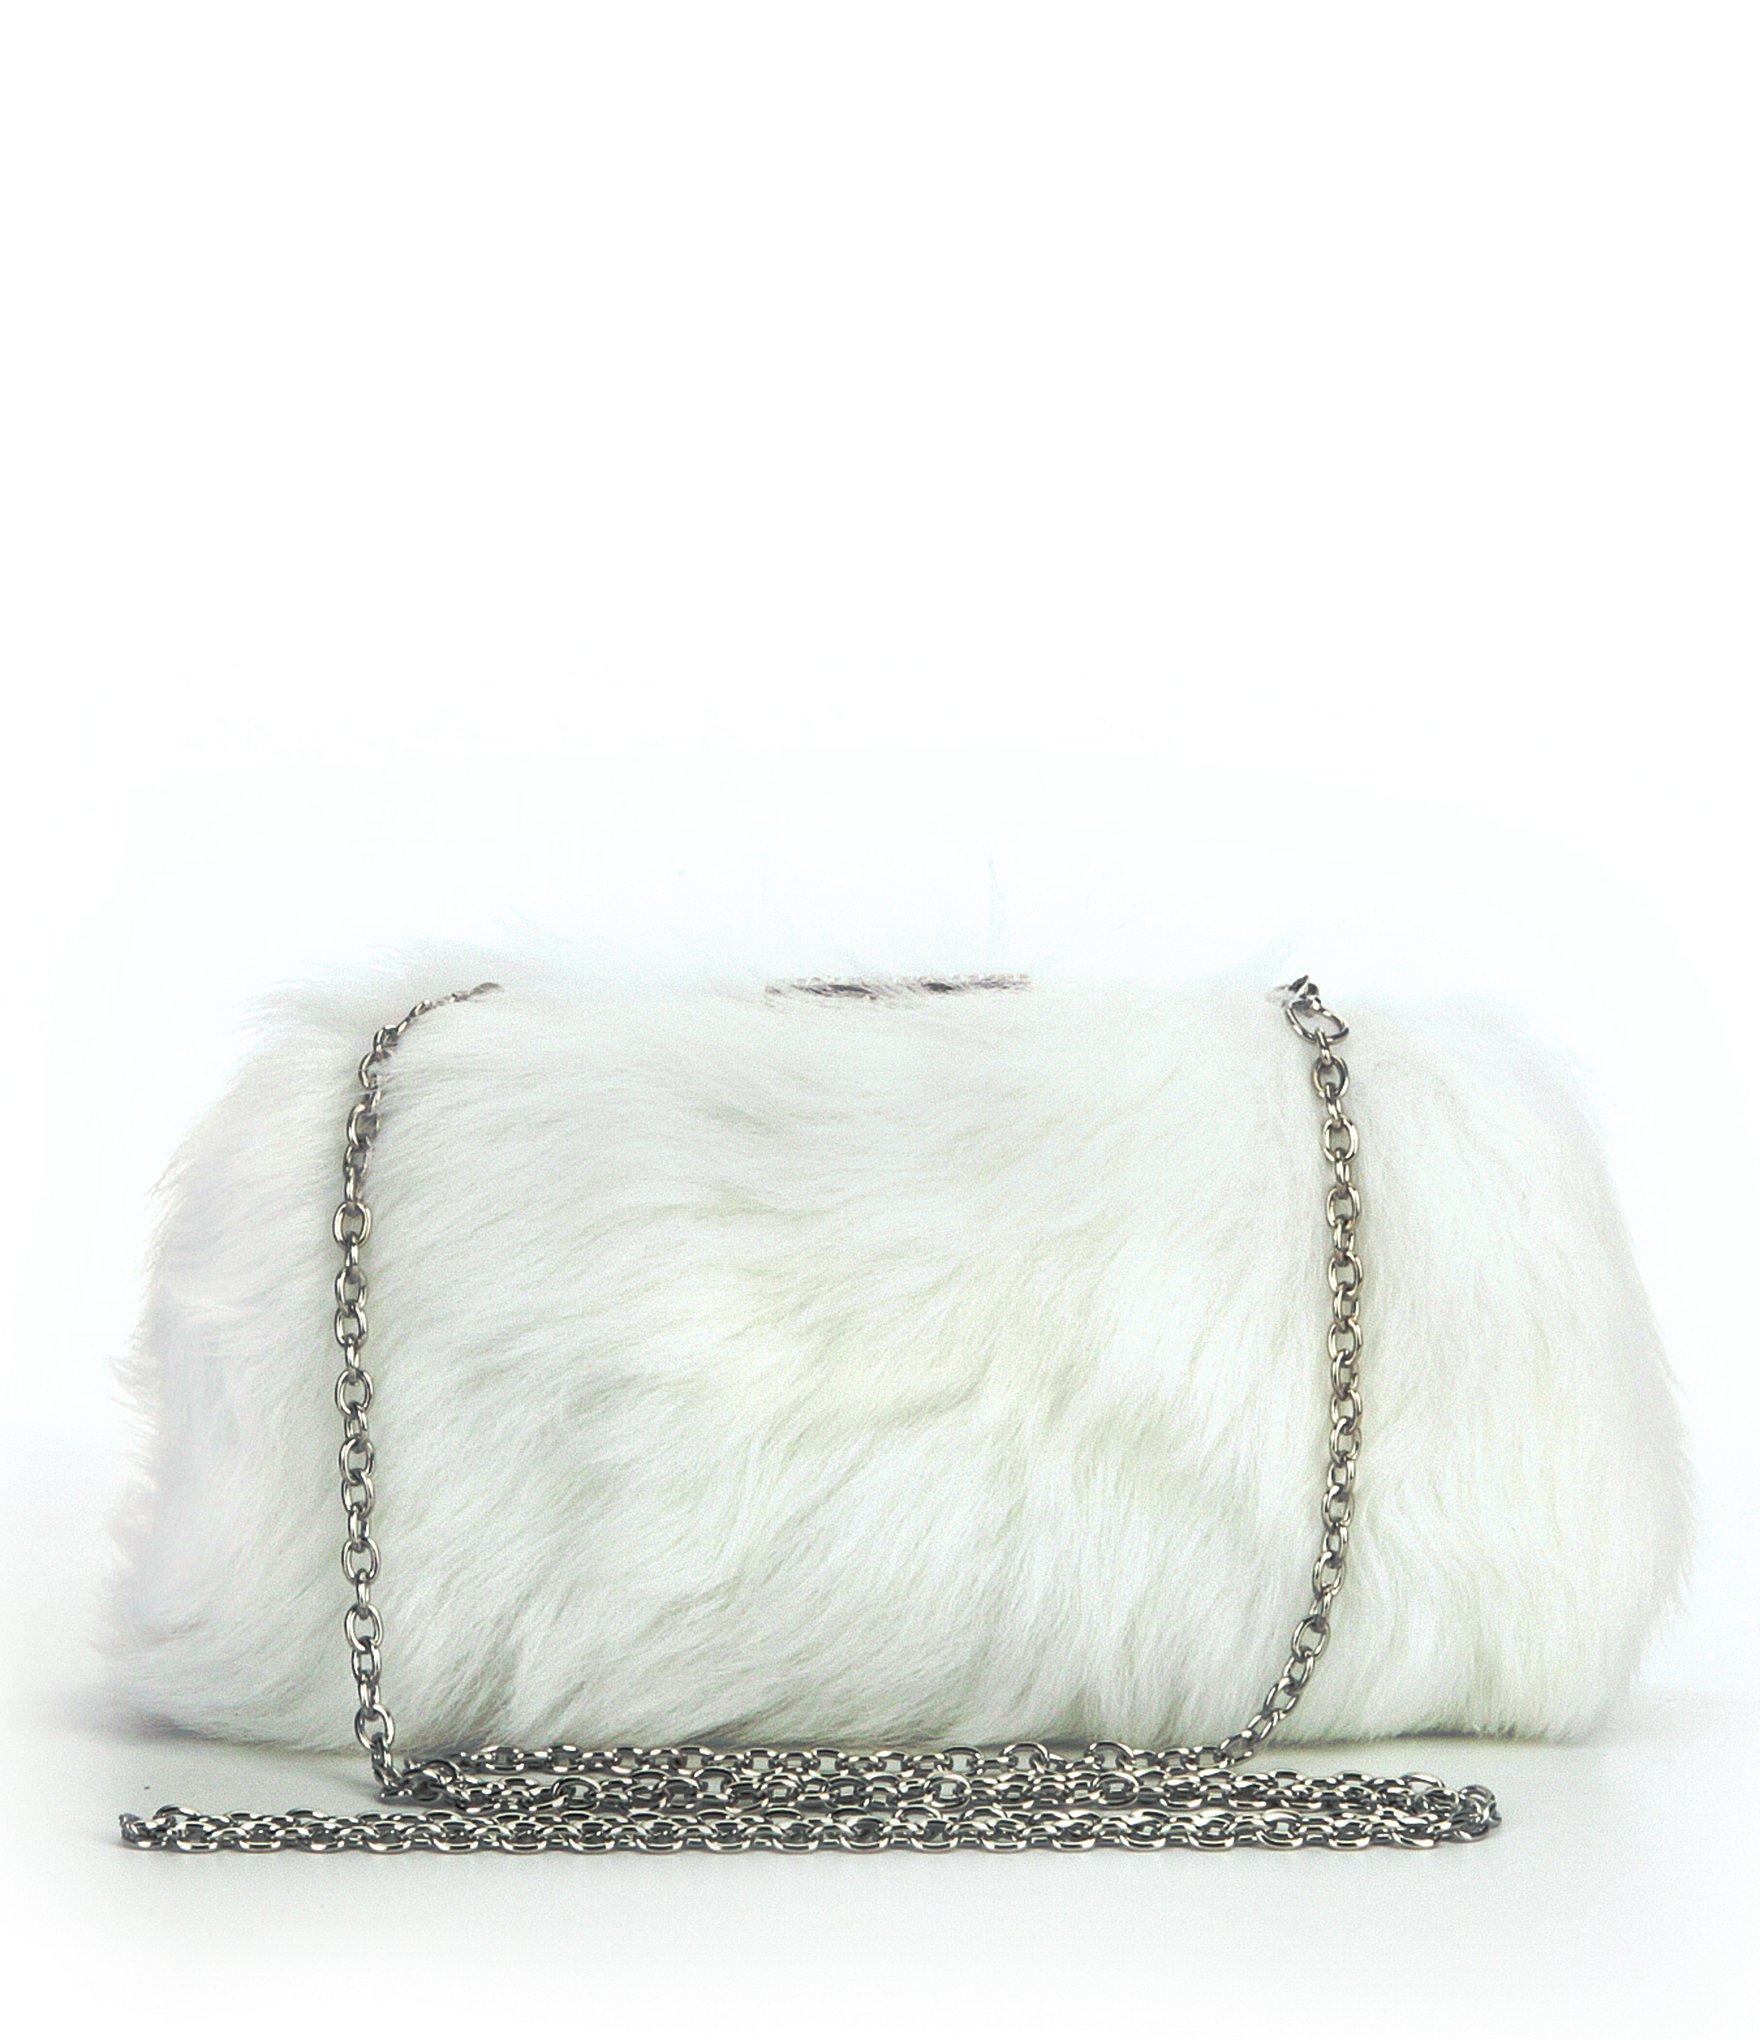 Lyst - UGG ® I Do! Everlasting Sheepskin Clutch in White eef9ec2d230d9